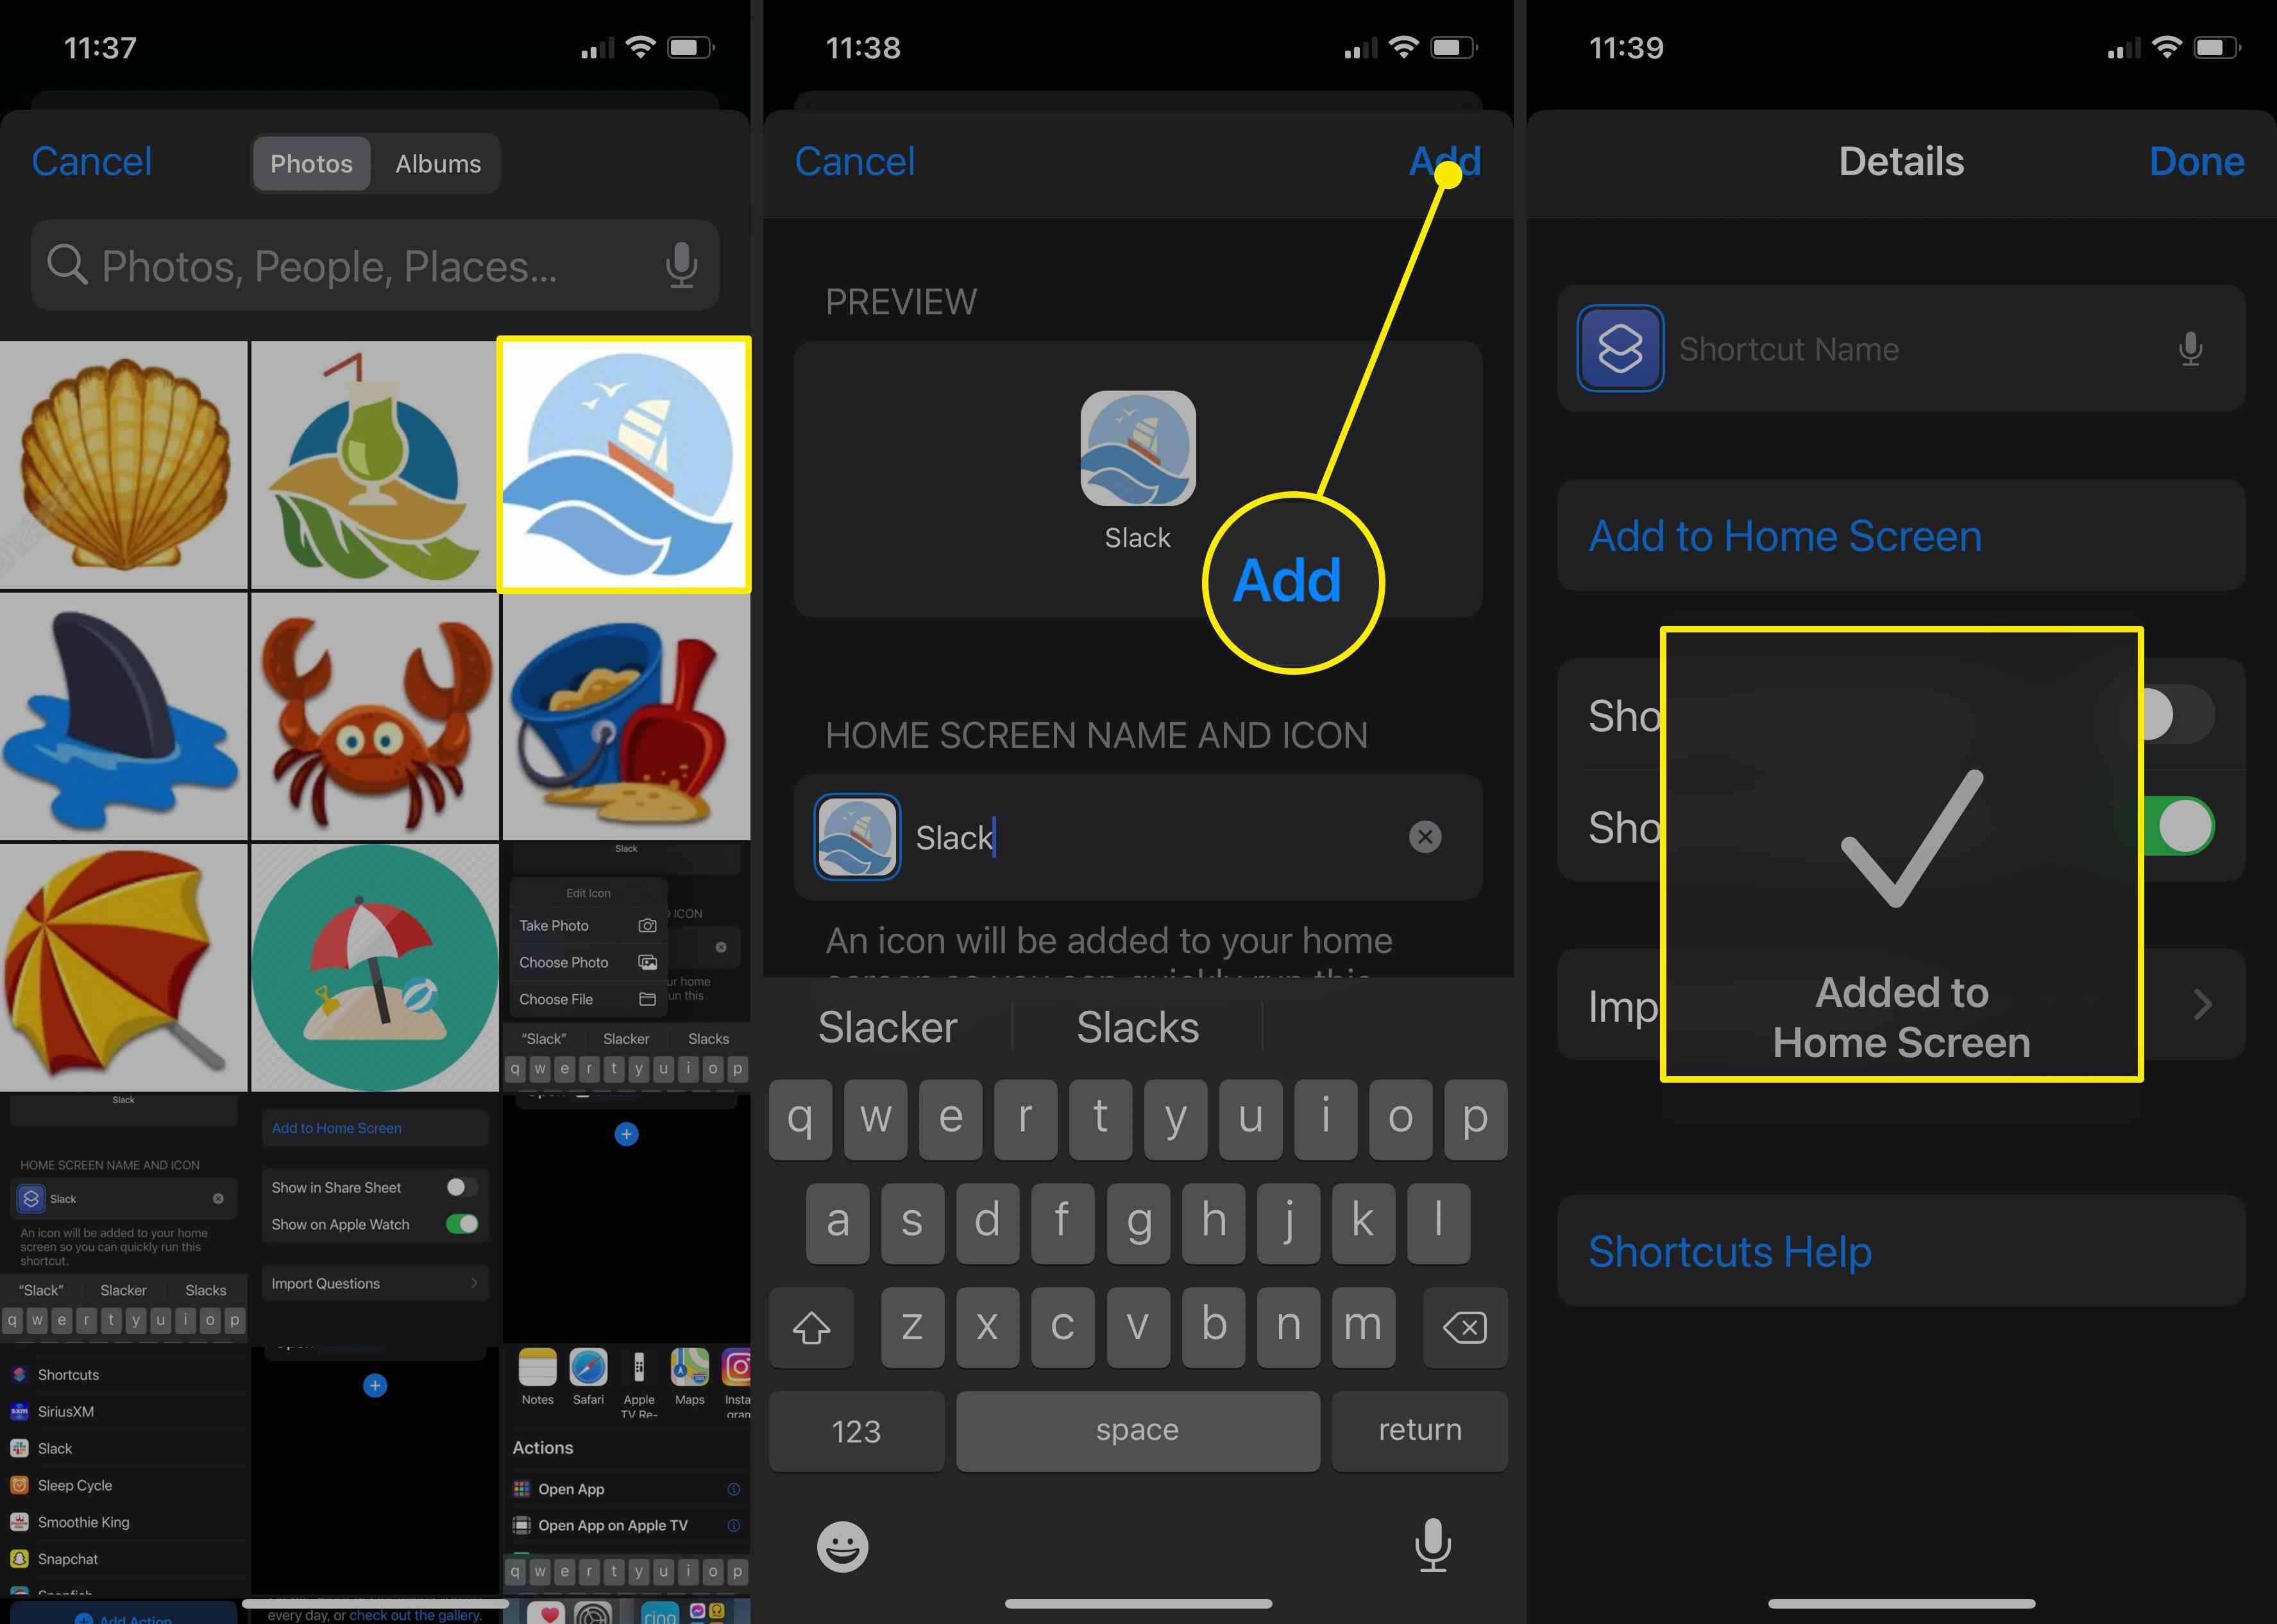 Finalizing a customized app shortcut in iOS 14.